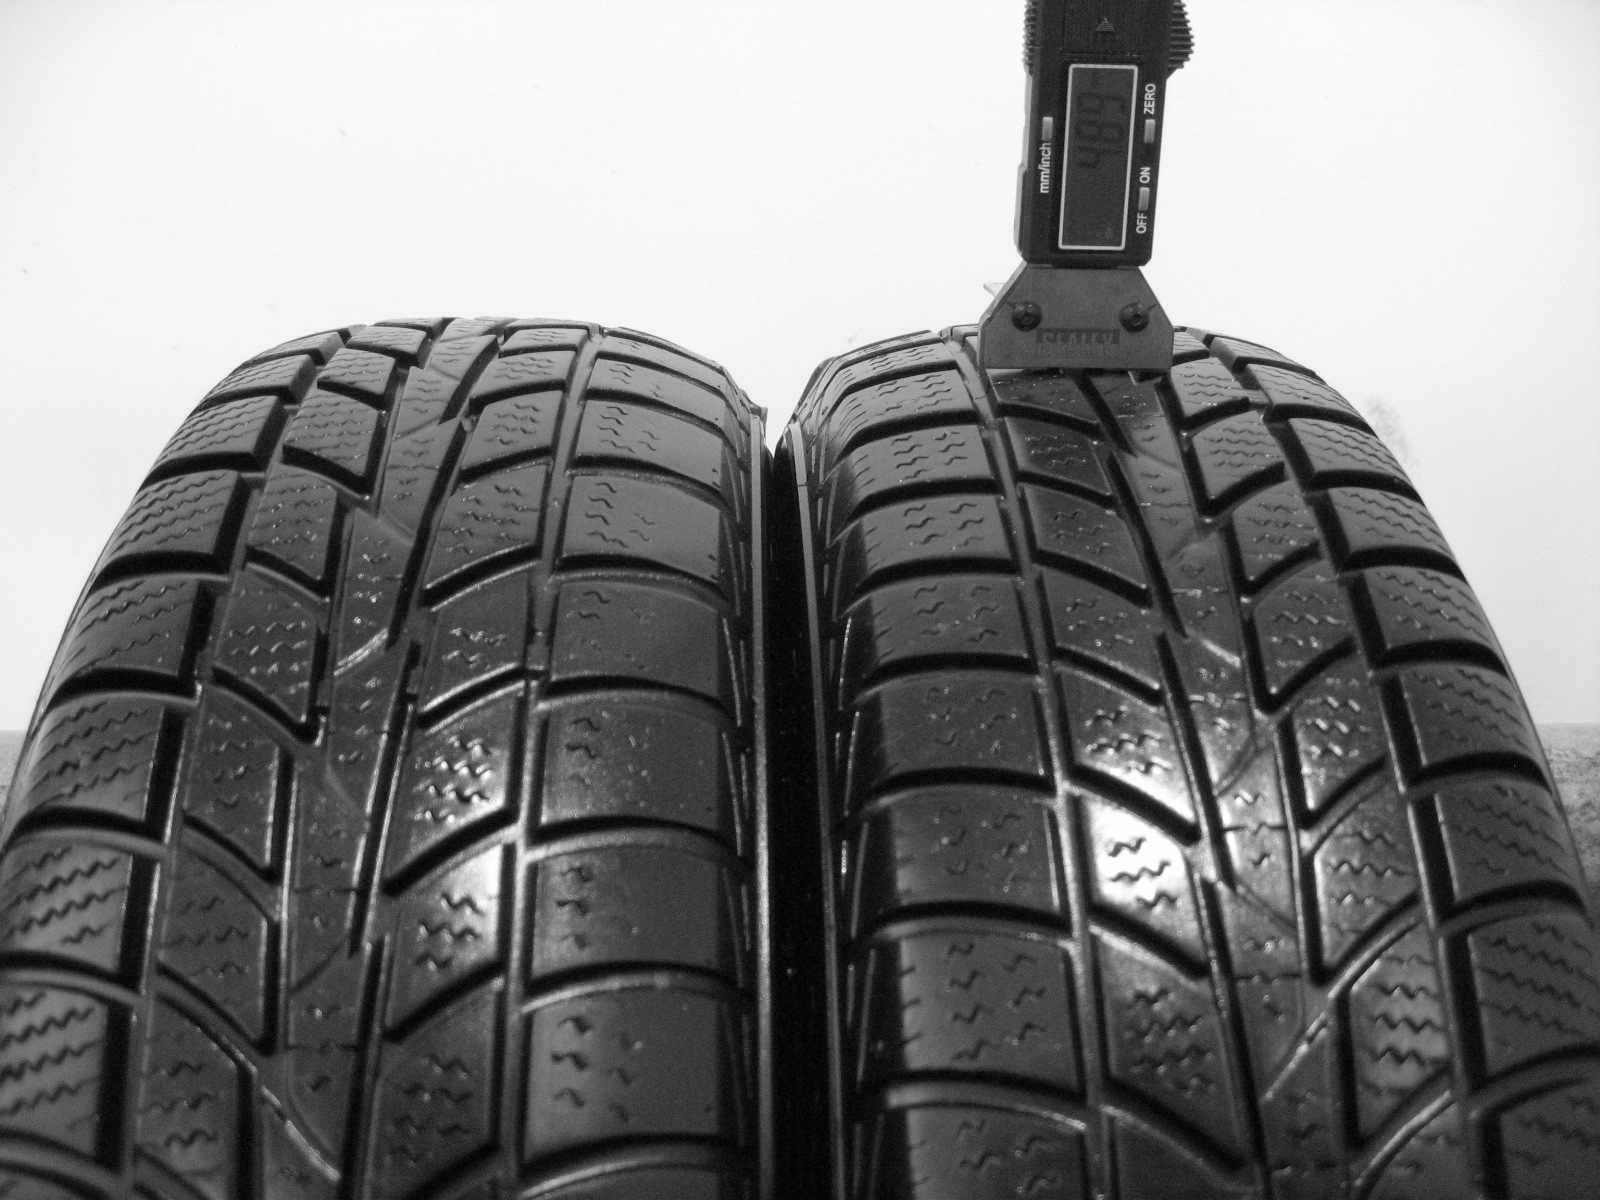 Použité-Pneu-Bazar - 155/70 R13 HANKOOK WINTER ICEPT RS DOT13 3mm